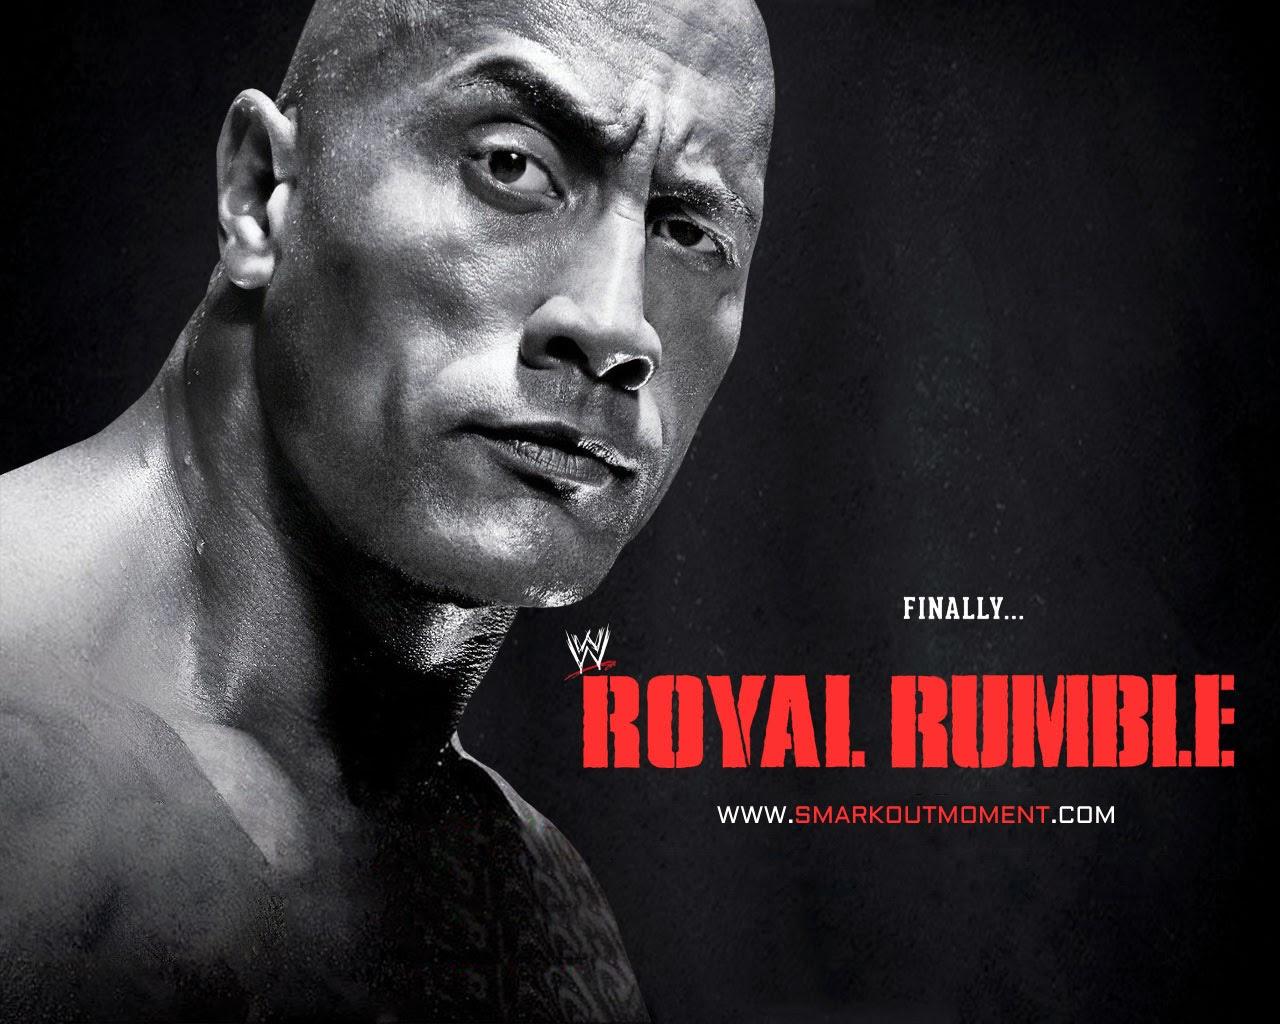 HD Wallpaper Royal Rumble WWE 2013 Poster Rock